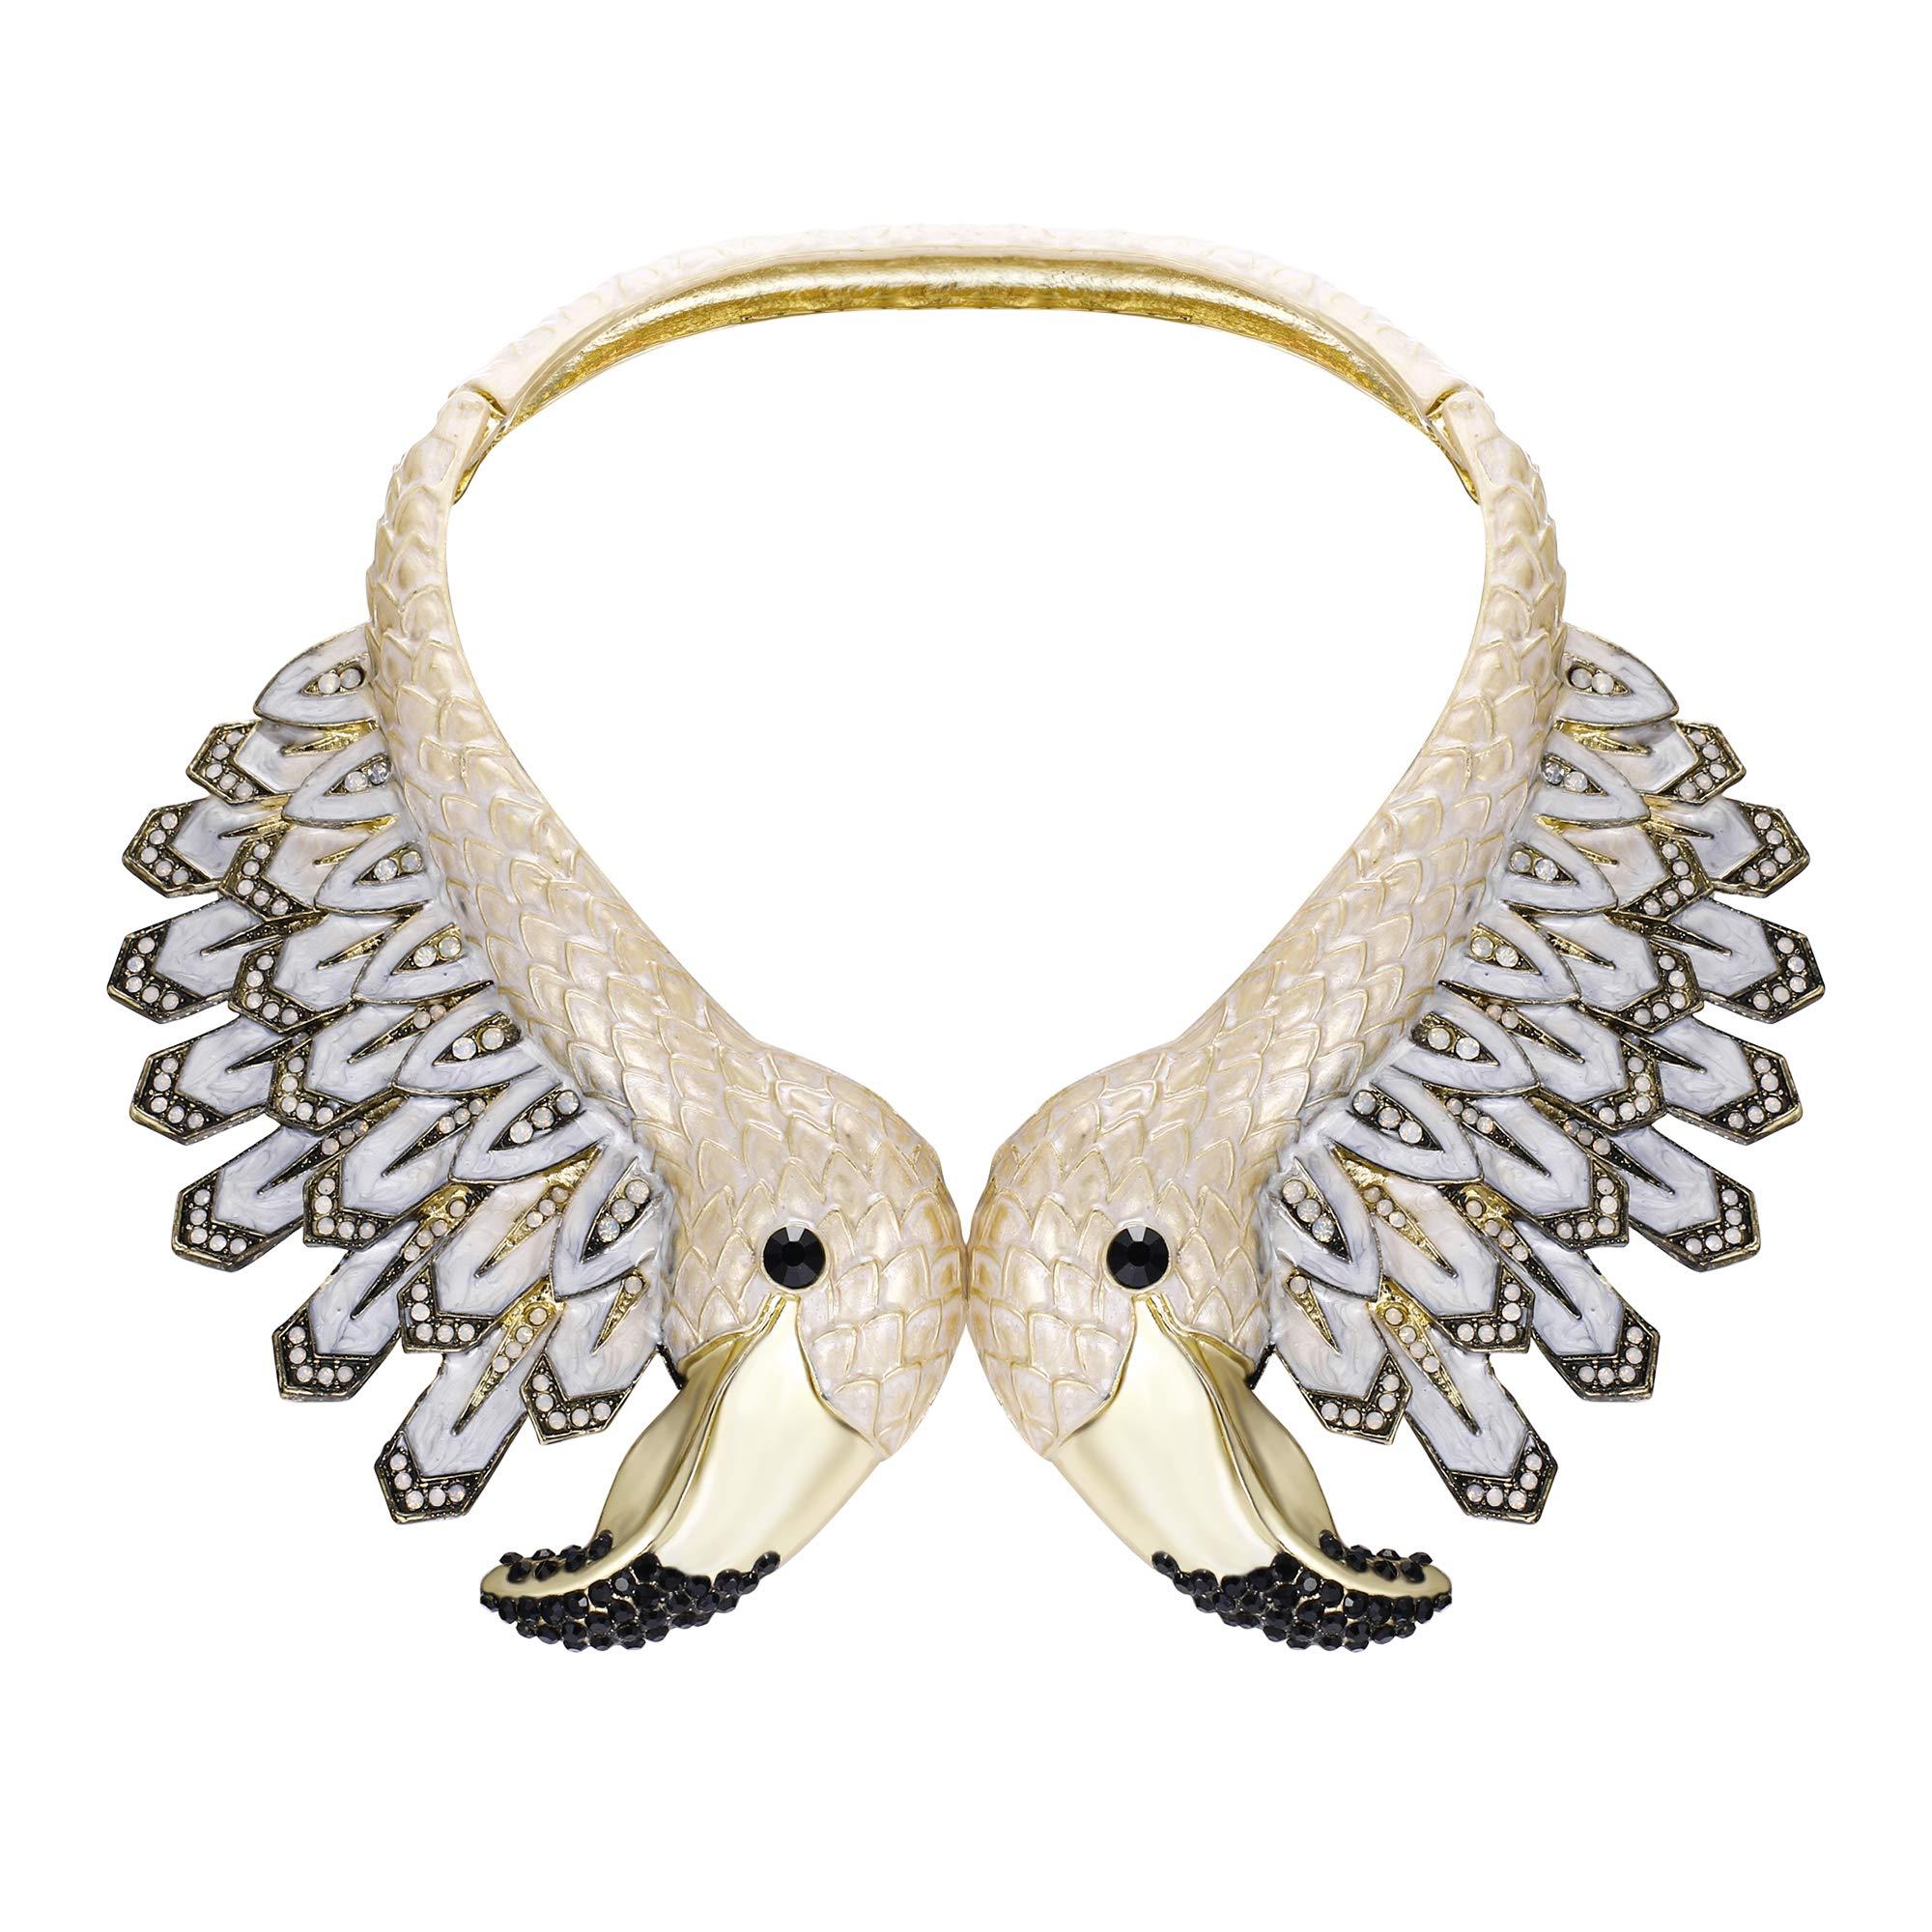 EVER FAITH Vintage Style 2 White Flamingo Statement Choker Necklace Austrian Crystal Gold-Tone